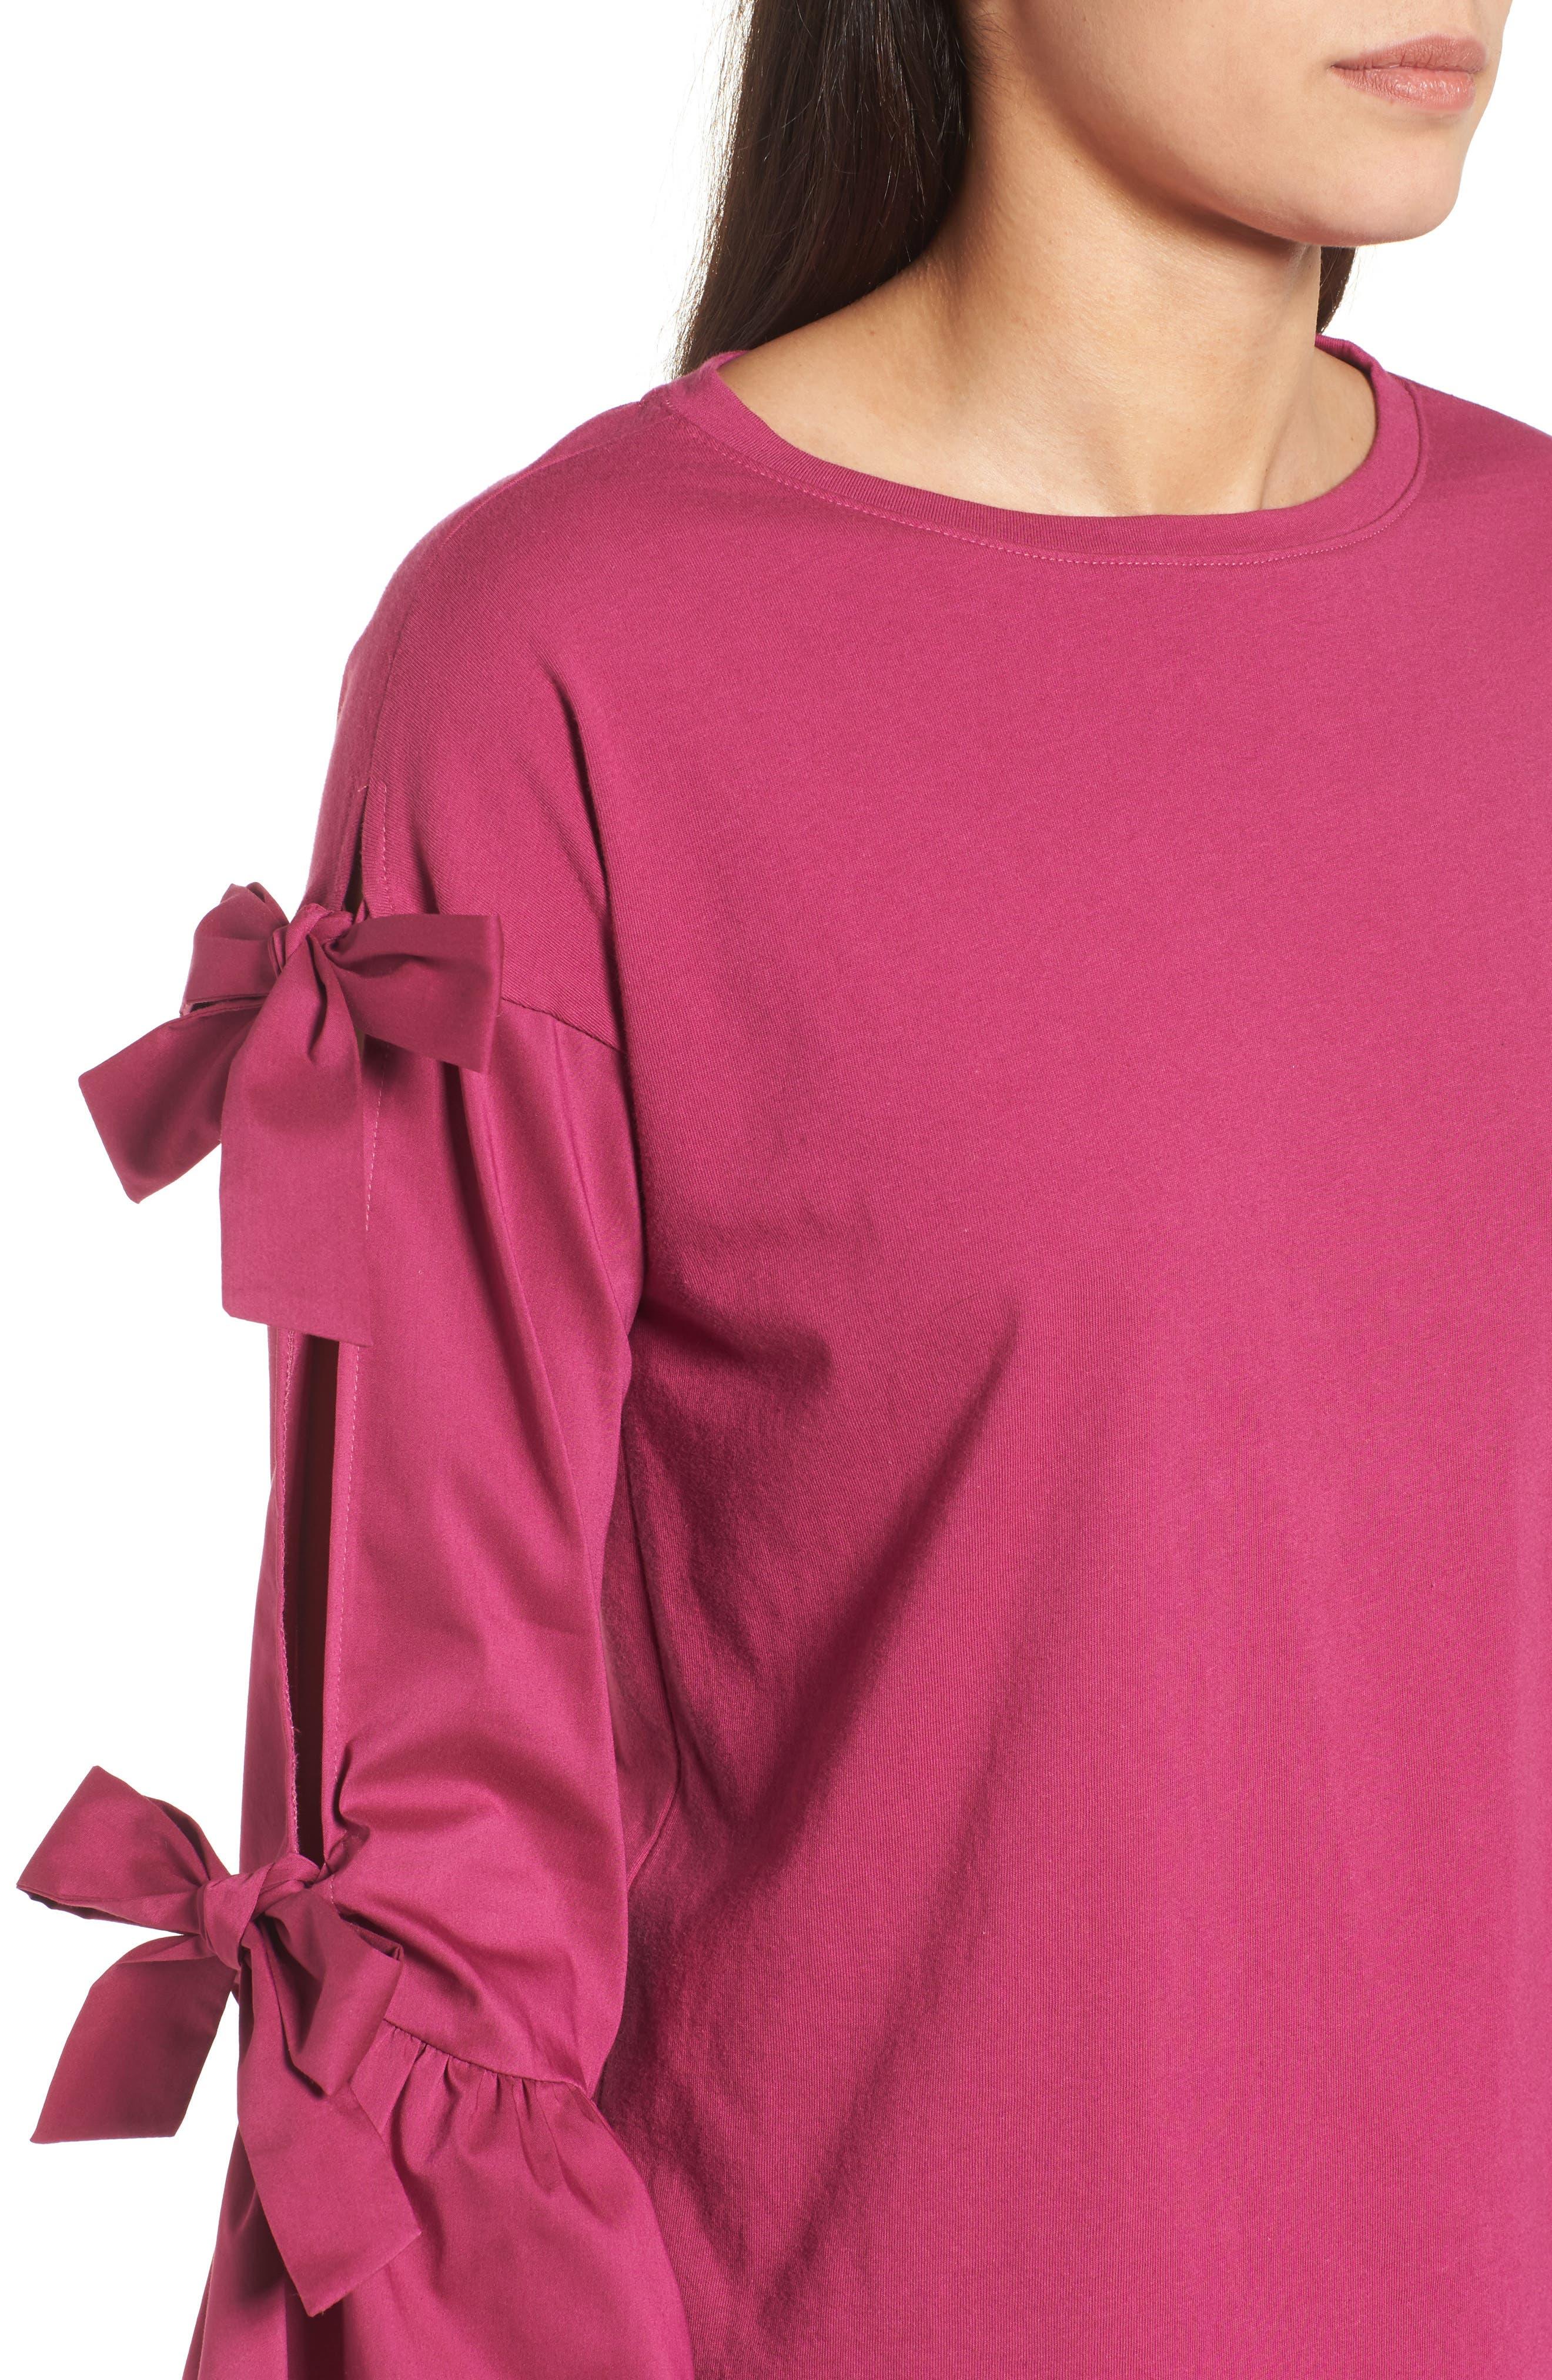 Bow Sleeve Poplin Cotton Top,                             Alternate thumbnail 4, color,                             Purple Boysen